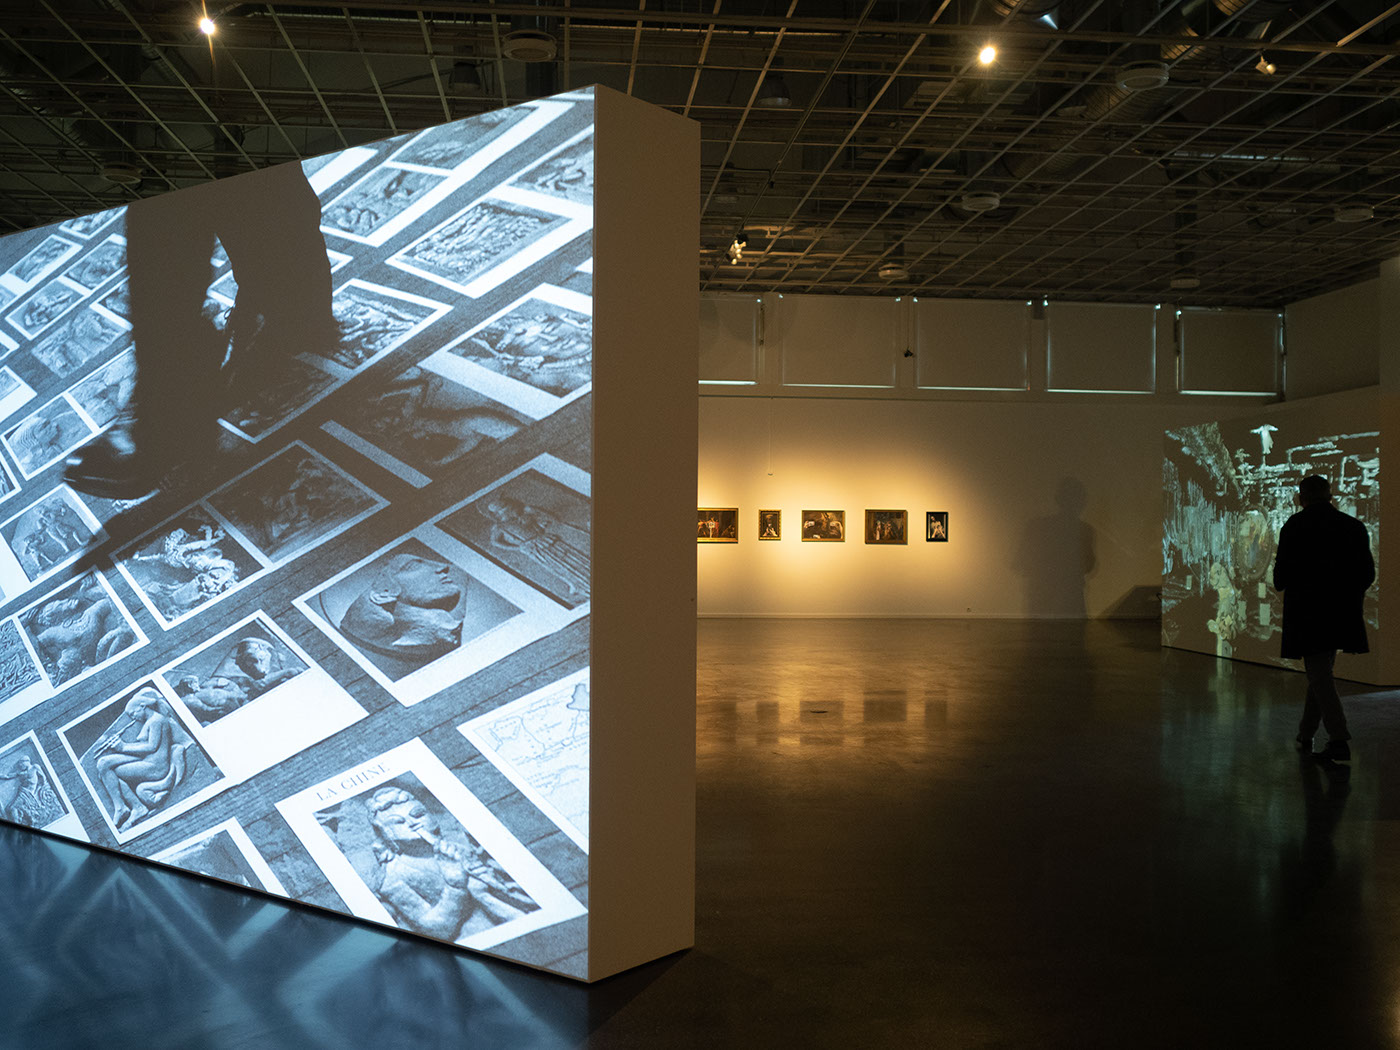 All Art is Photography - Kunstverein Ludwigshafen - Biennale fur Aktuelle Fotografie